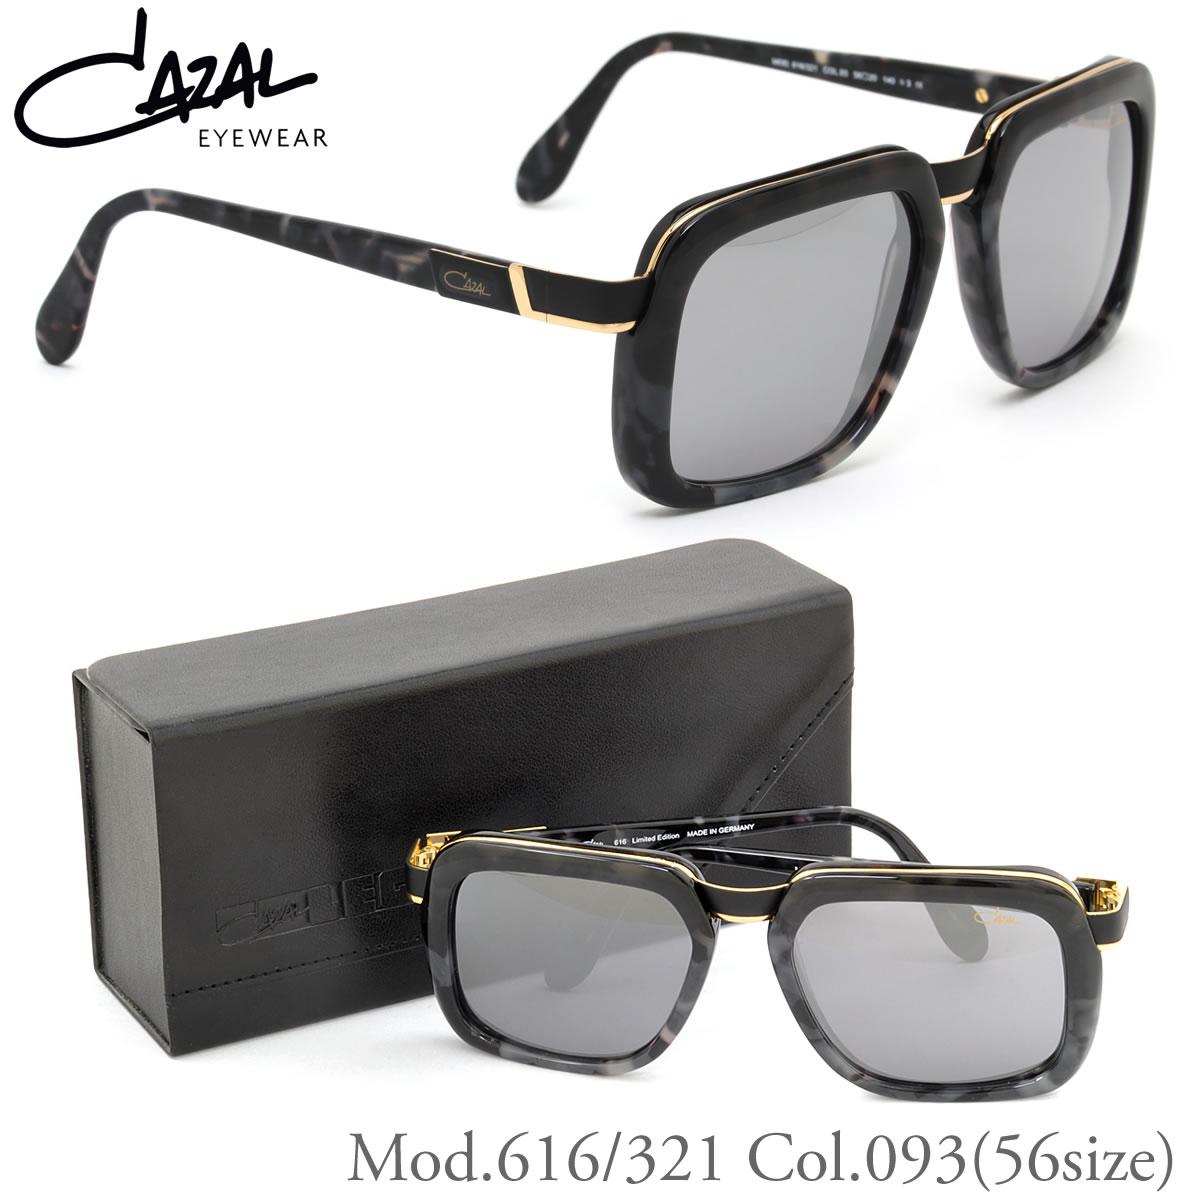 【CAZAL】(カザール) レジェンズ サングラス 616/321 093 56サイズ スクエア 限定 ミラーレンズ仕様 カザール CAZAL Limited Edition メンズ レディース